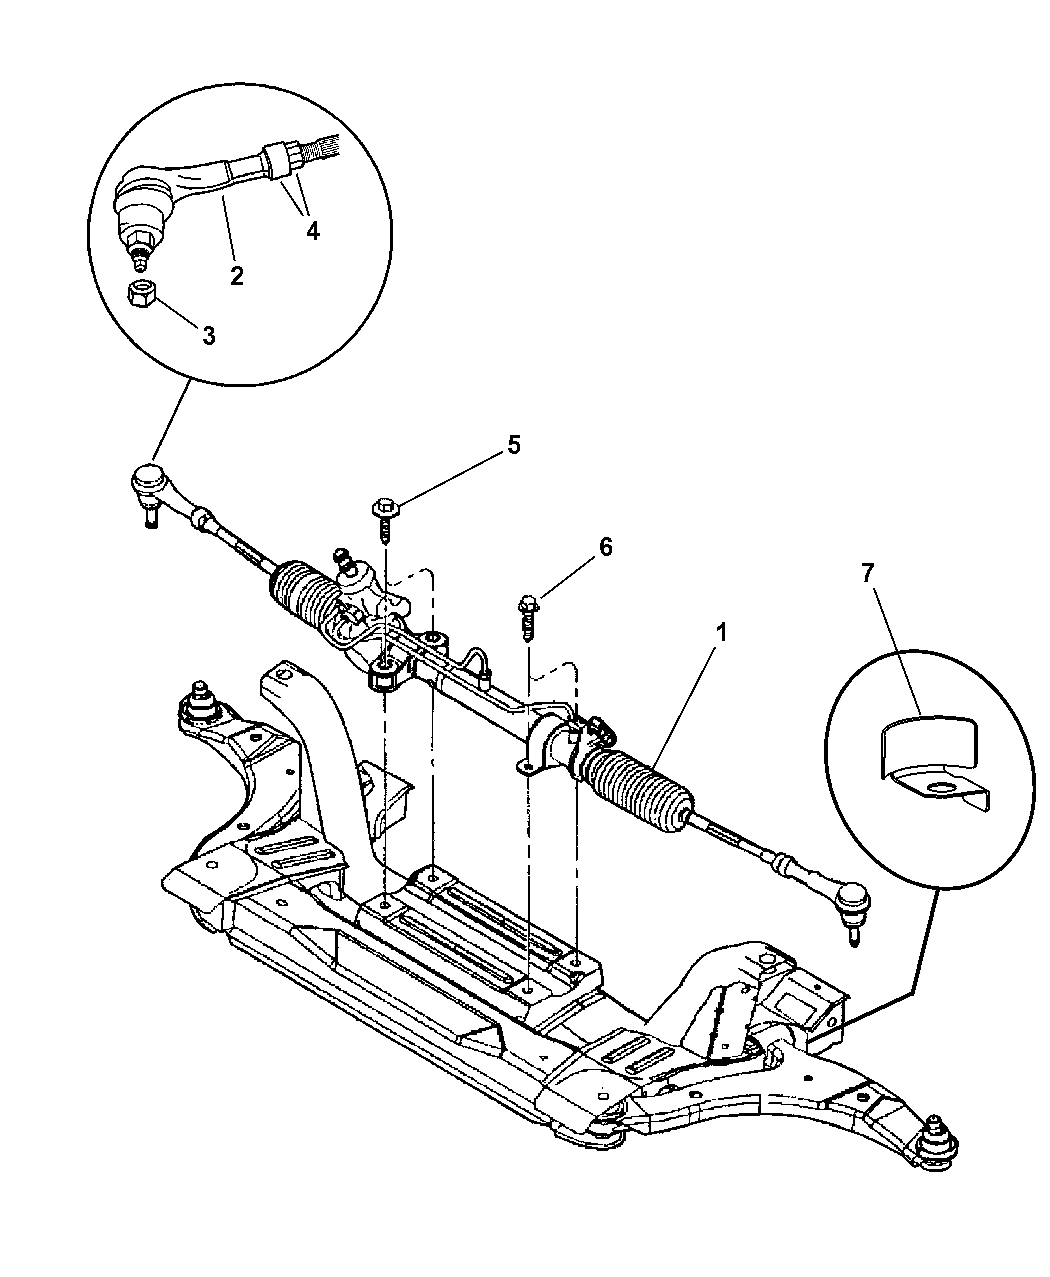 [SCHEMATICS_4UK]  C5F 2003 Dodge Neon Parts Diagram Wiring Schematic | Wiring Library | 2005 Dodge Neon Engine Parts Diagram |  | Wiring Library